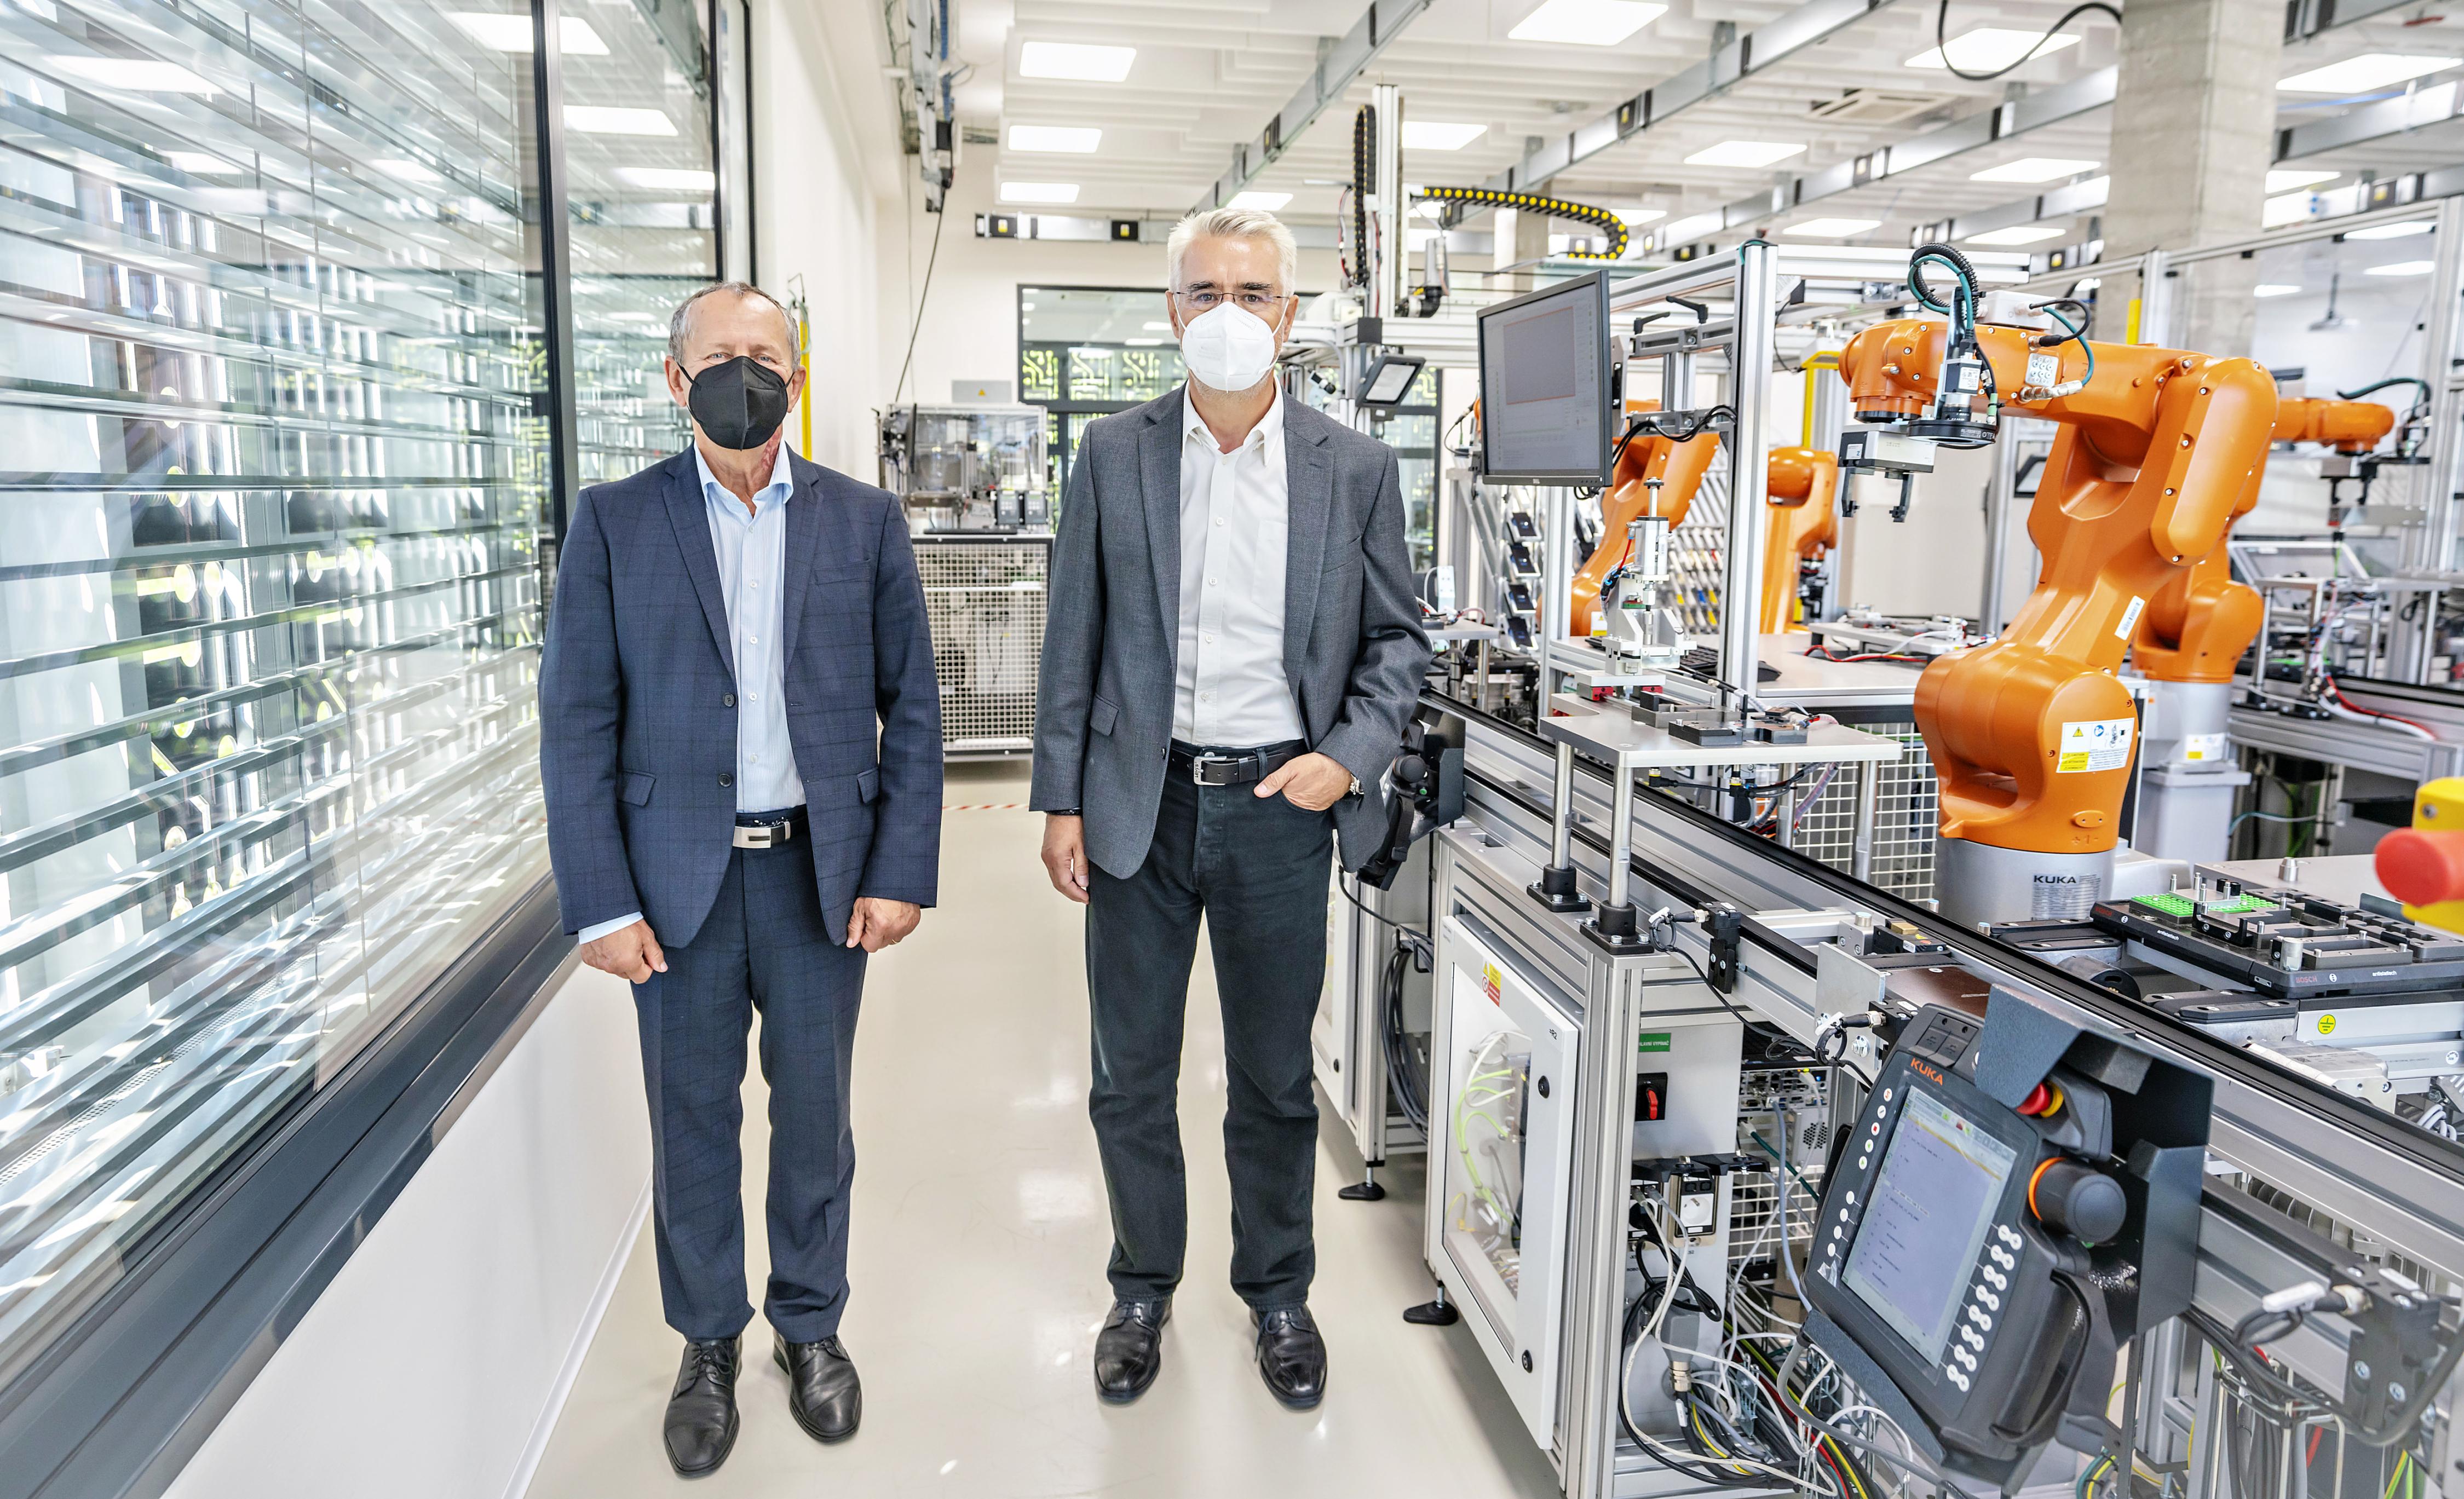 SKODA AUTO opens AIM.Lab in collaboration with the Technical University of Ostrava VSB-TUO - Image 2